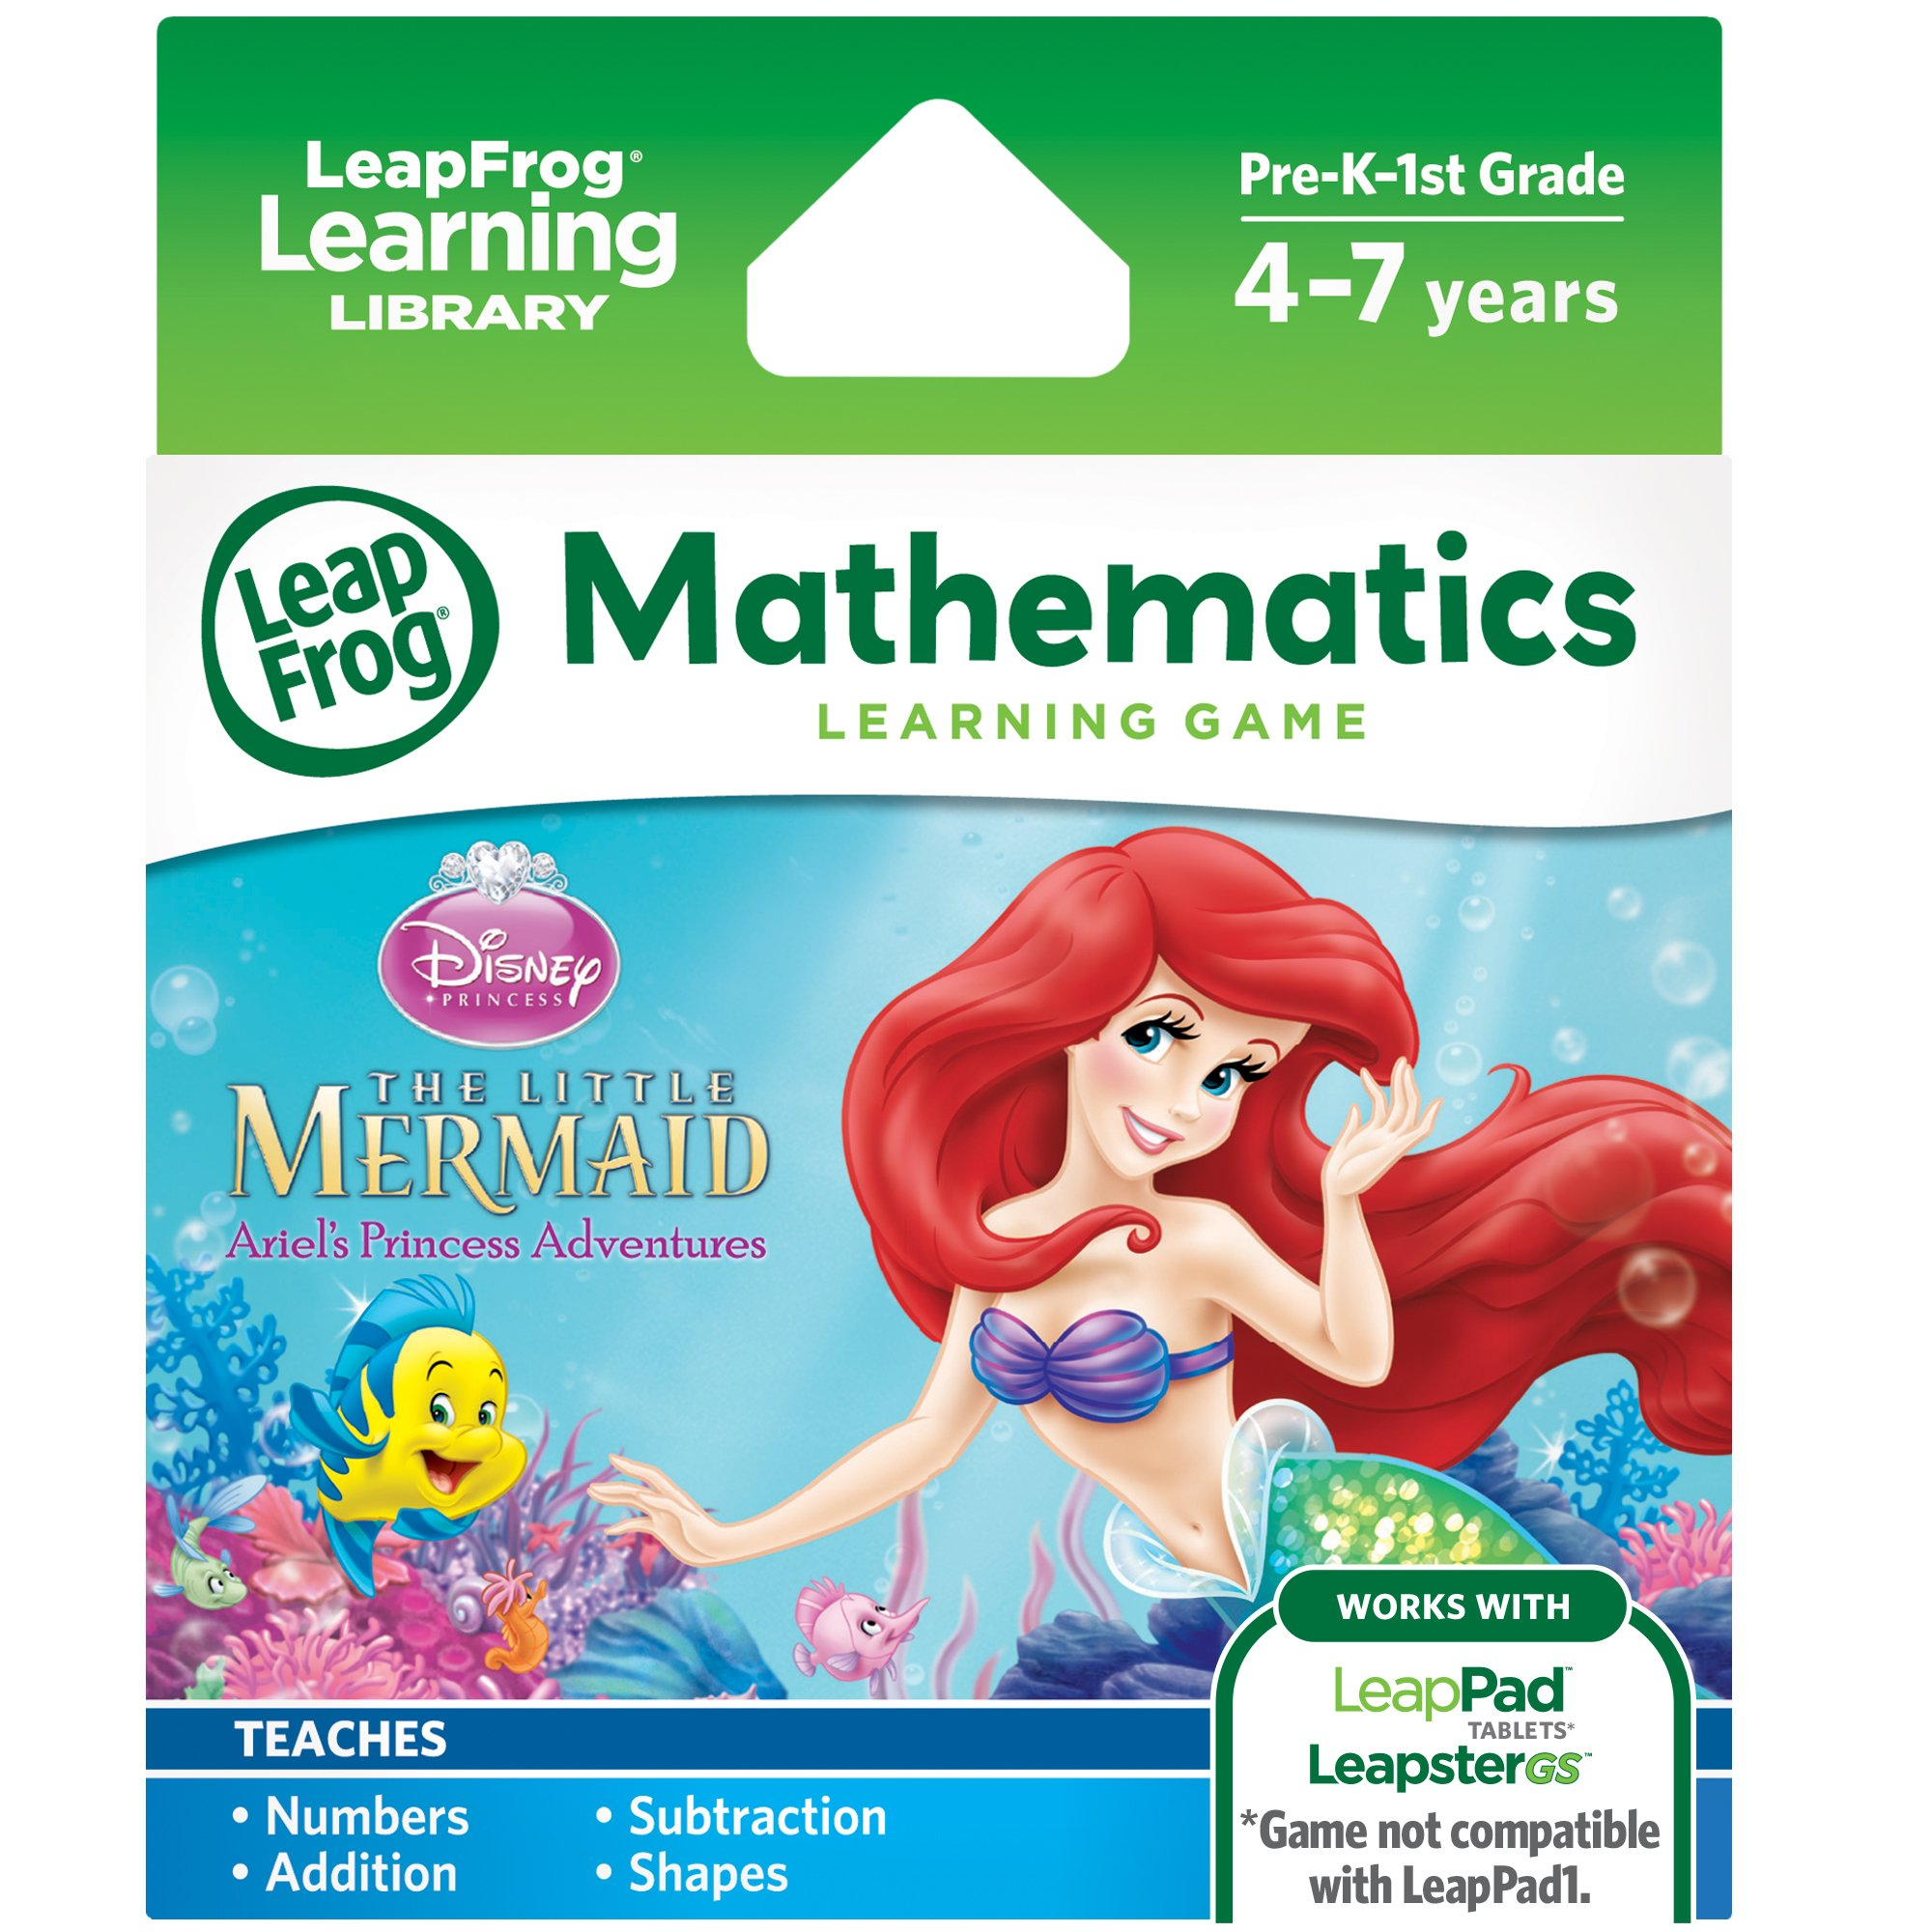 LeapFrog Disney The Little Mermaid Learning Game (for LeapPad Platinum, LeapPad Ultra, LeapPad2, LeapPad3, LeapsterGS Explorer) by LeapFrog